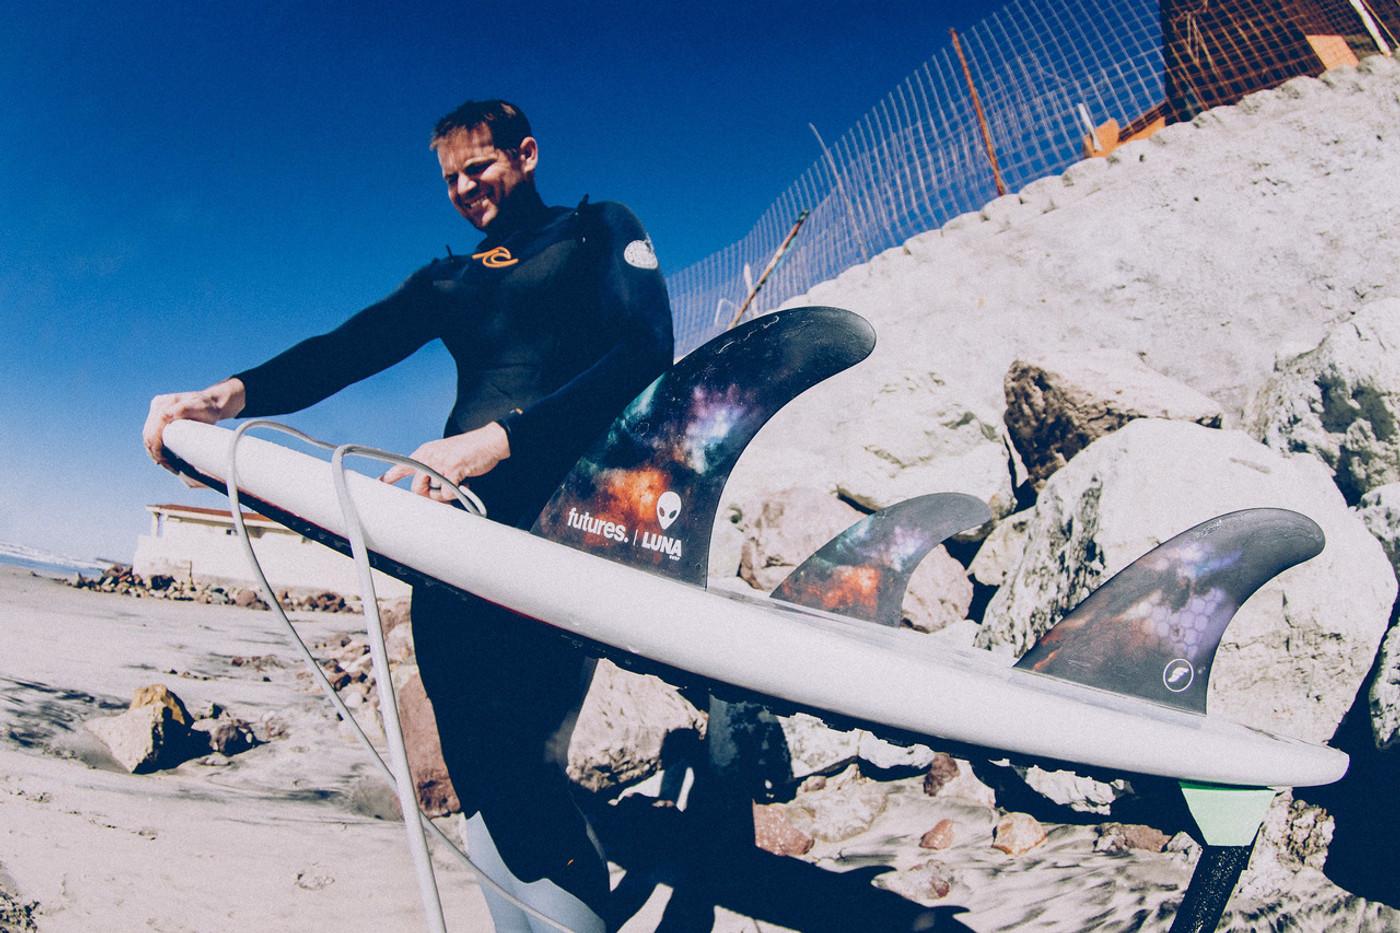 Huntington Beach surf legend Timmy Turner riding Lunasurf thruster set in Baja, Mexico